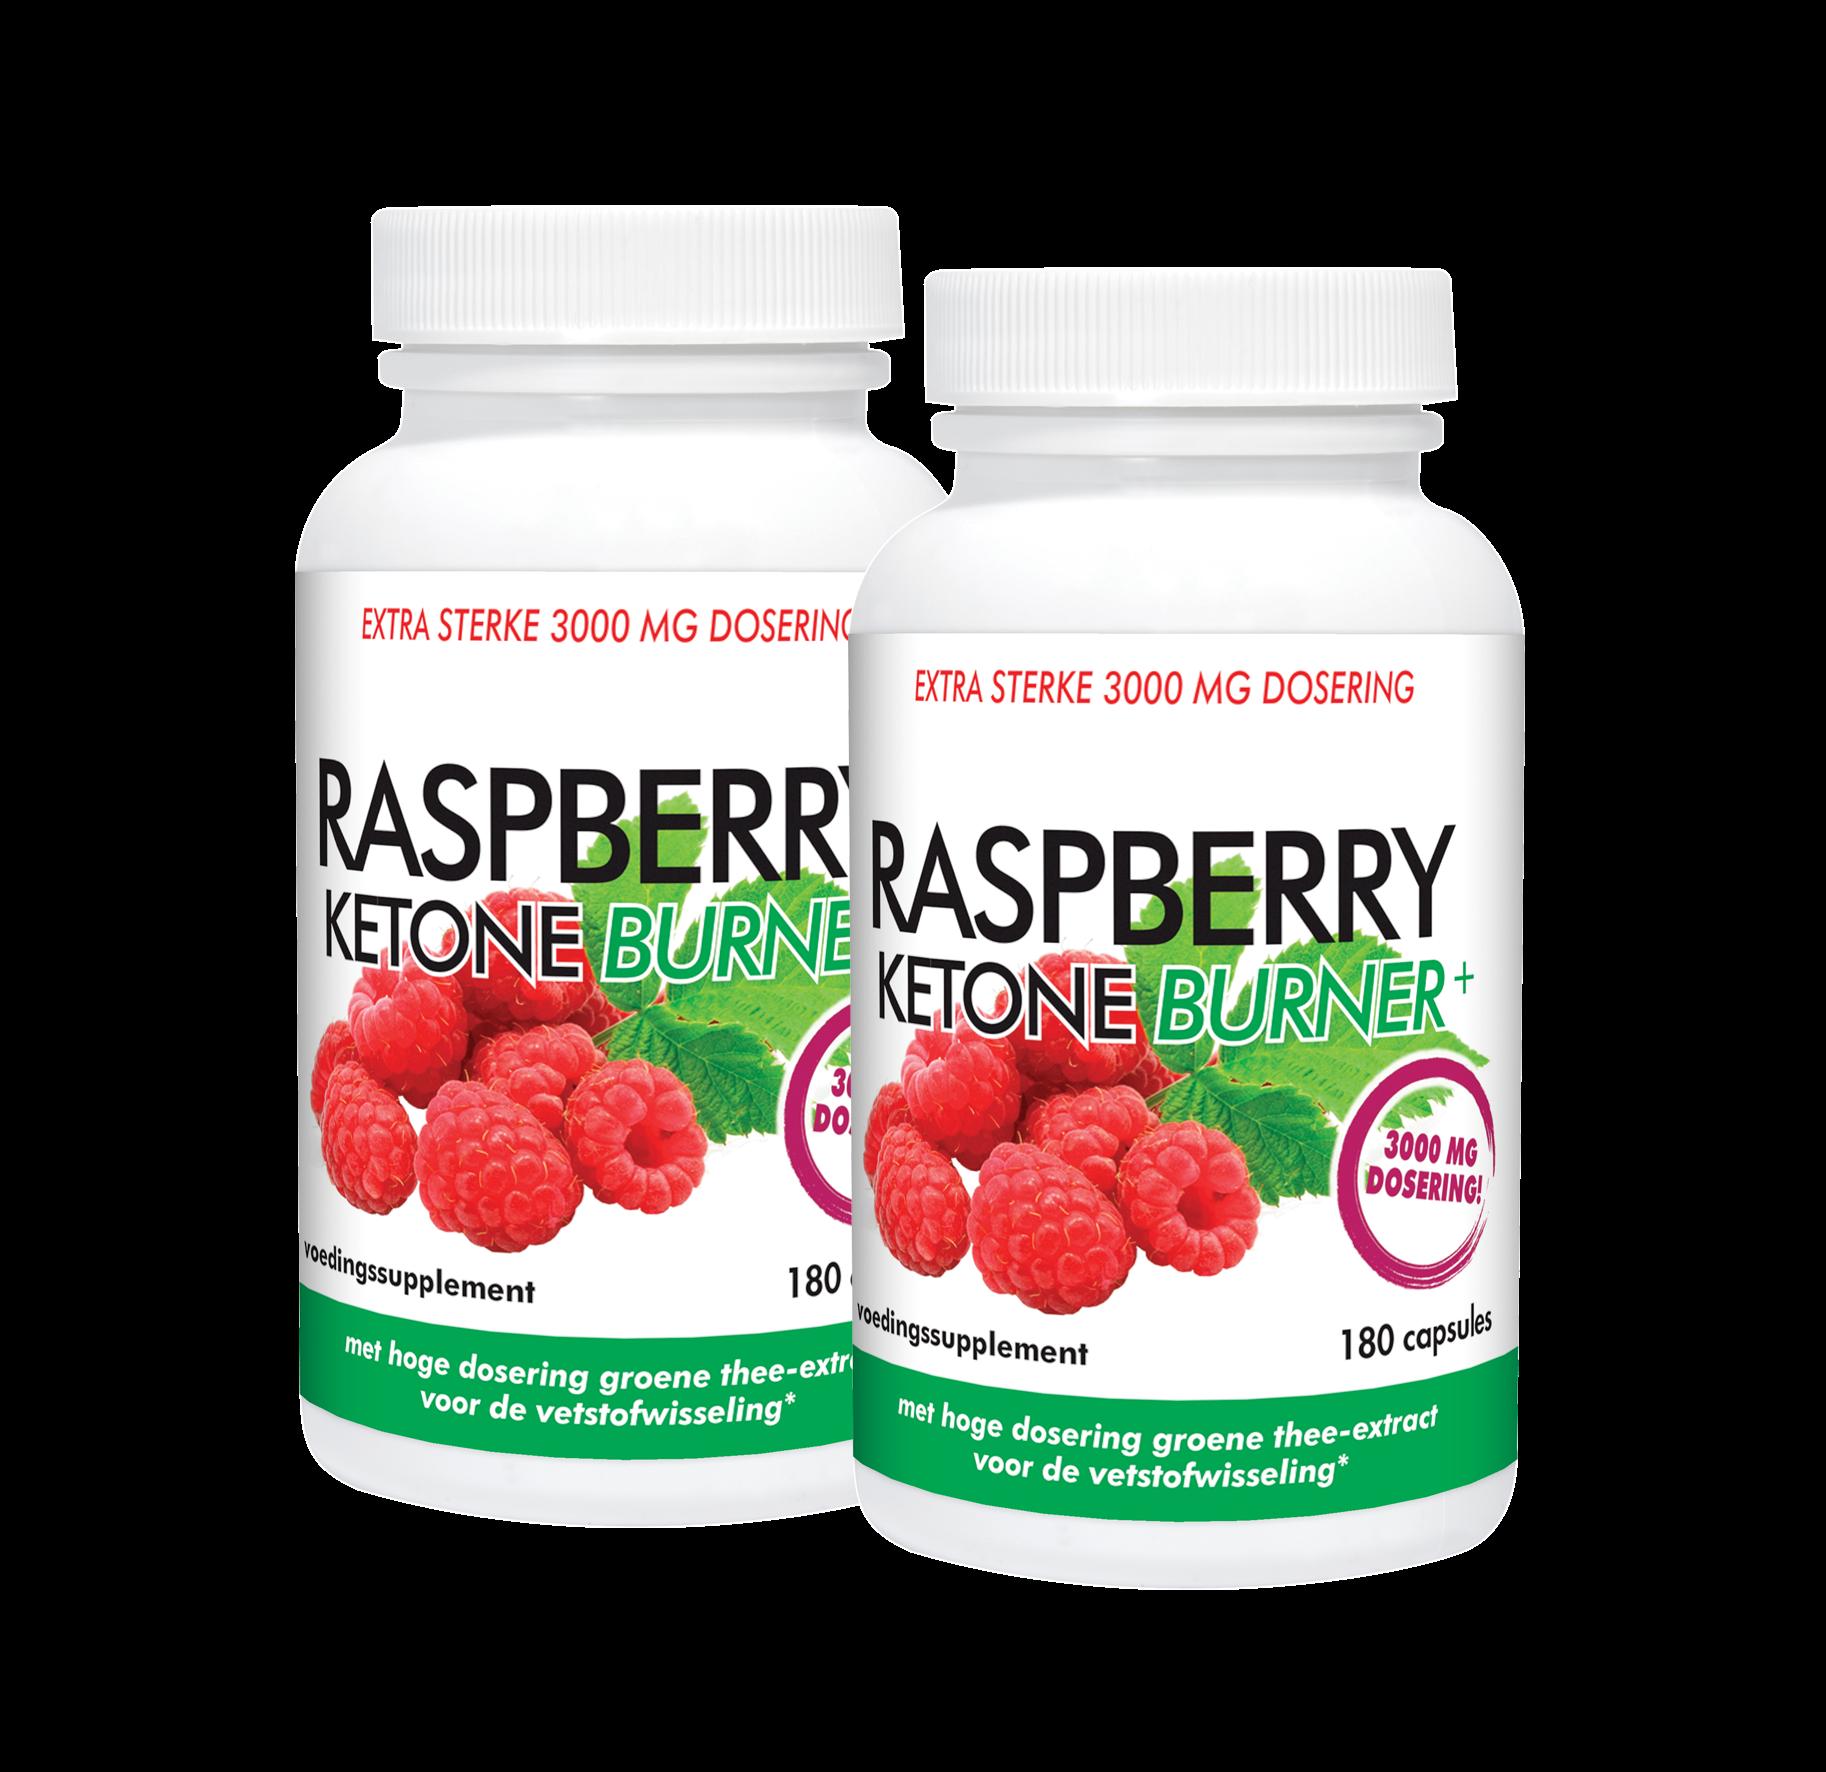 Natusor Duopakket Raspberry Ketone Burner+ (2 x 180 capsules)